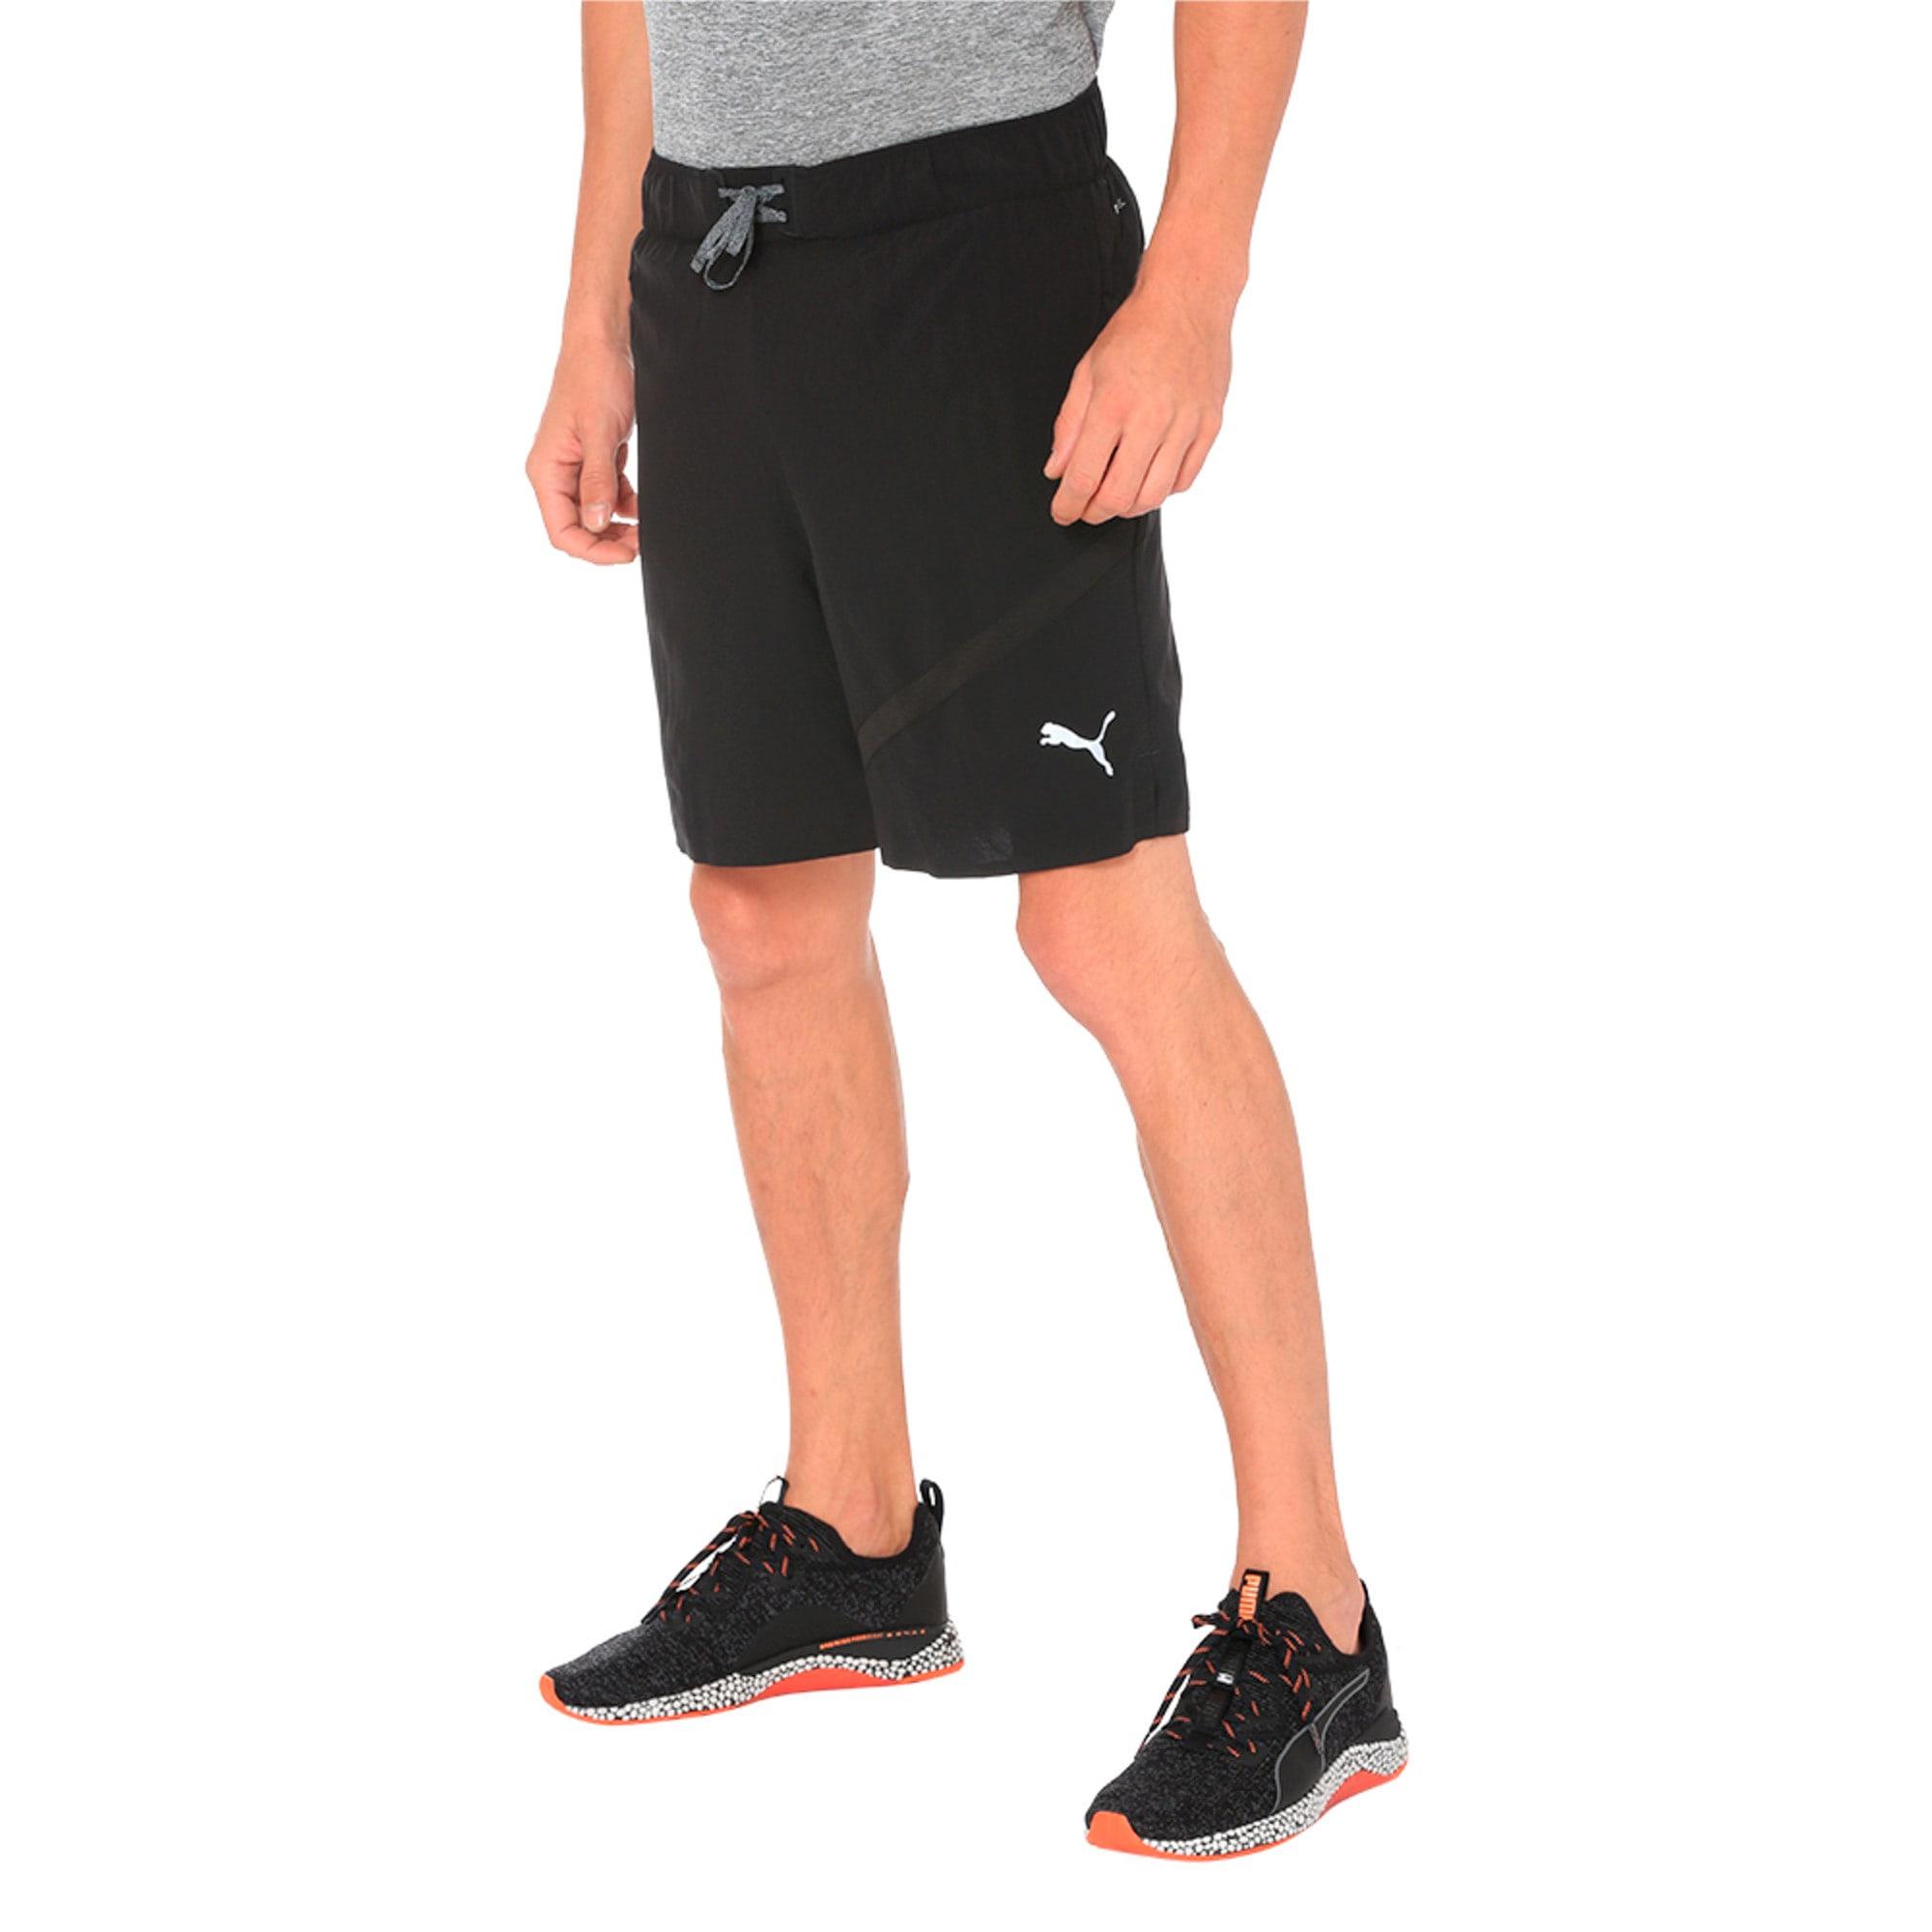 "Thumbnail 1 of Pace 7"" Men's Running Shorts, Puma Black, medium-IND"